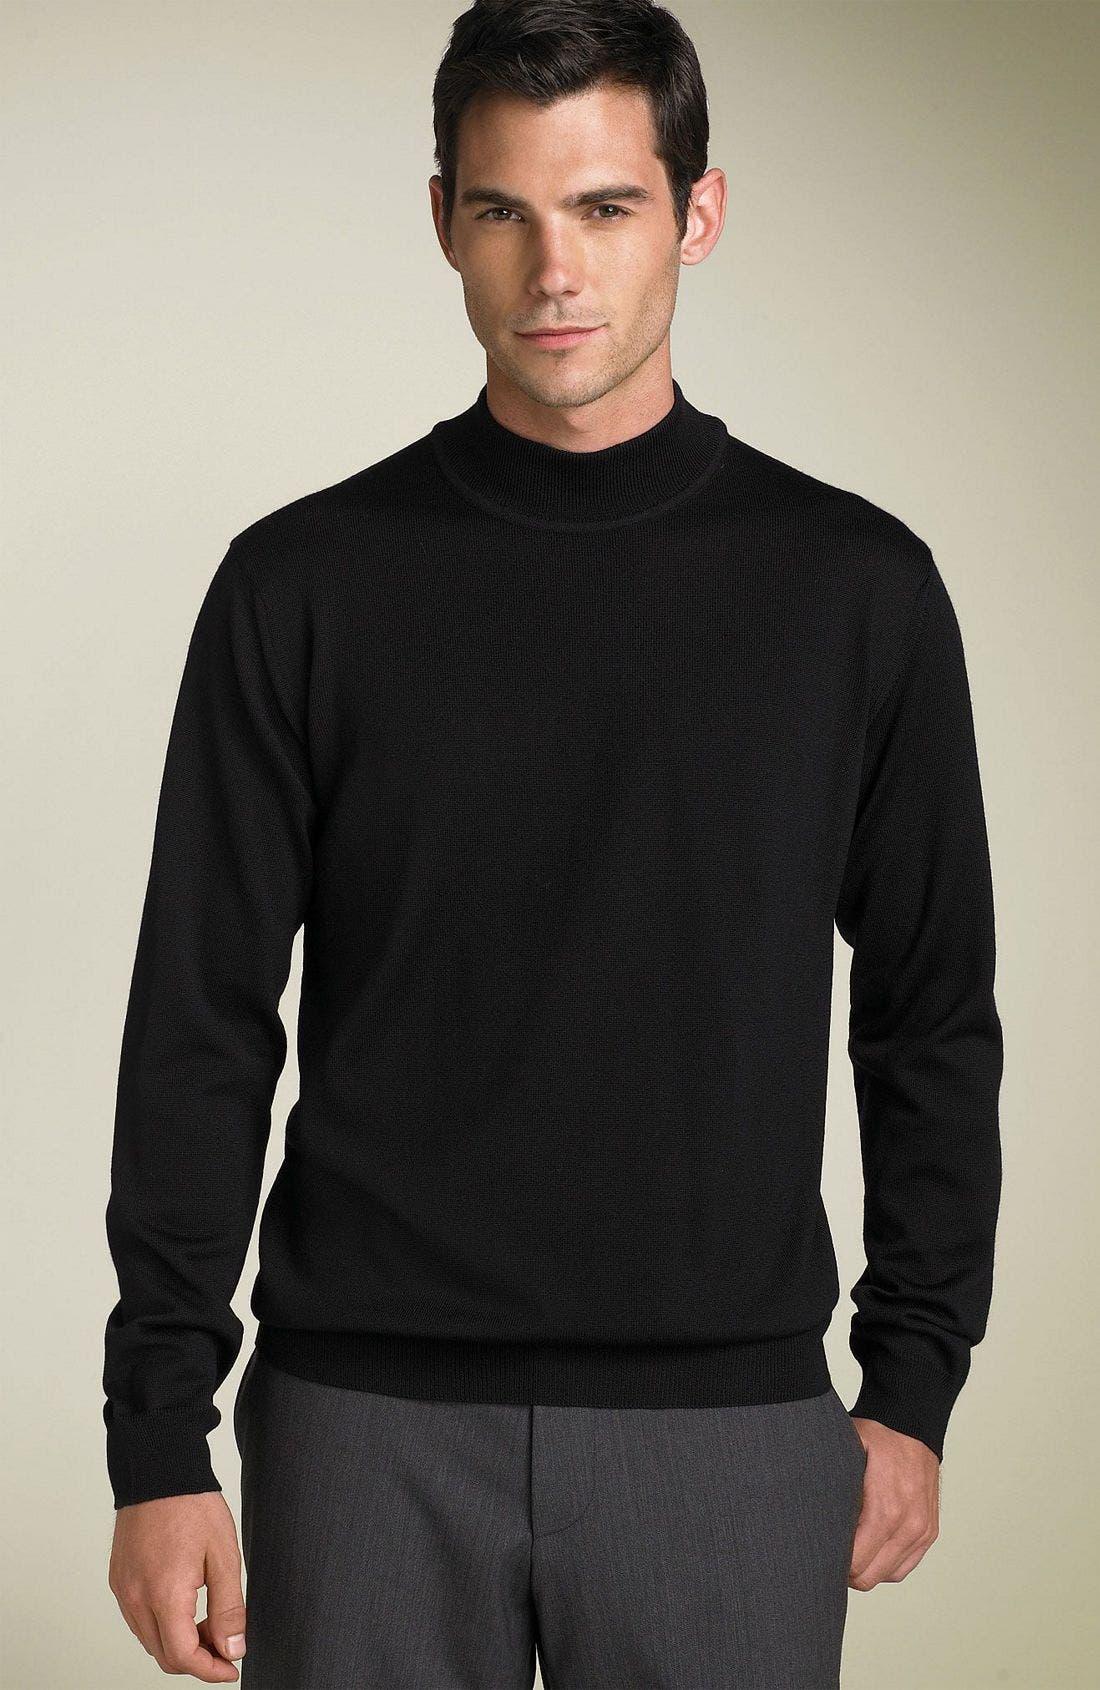 Merino Wool Mock Turtleneck Sweater, Main, color, 001